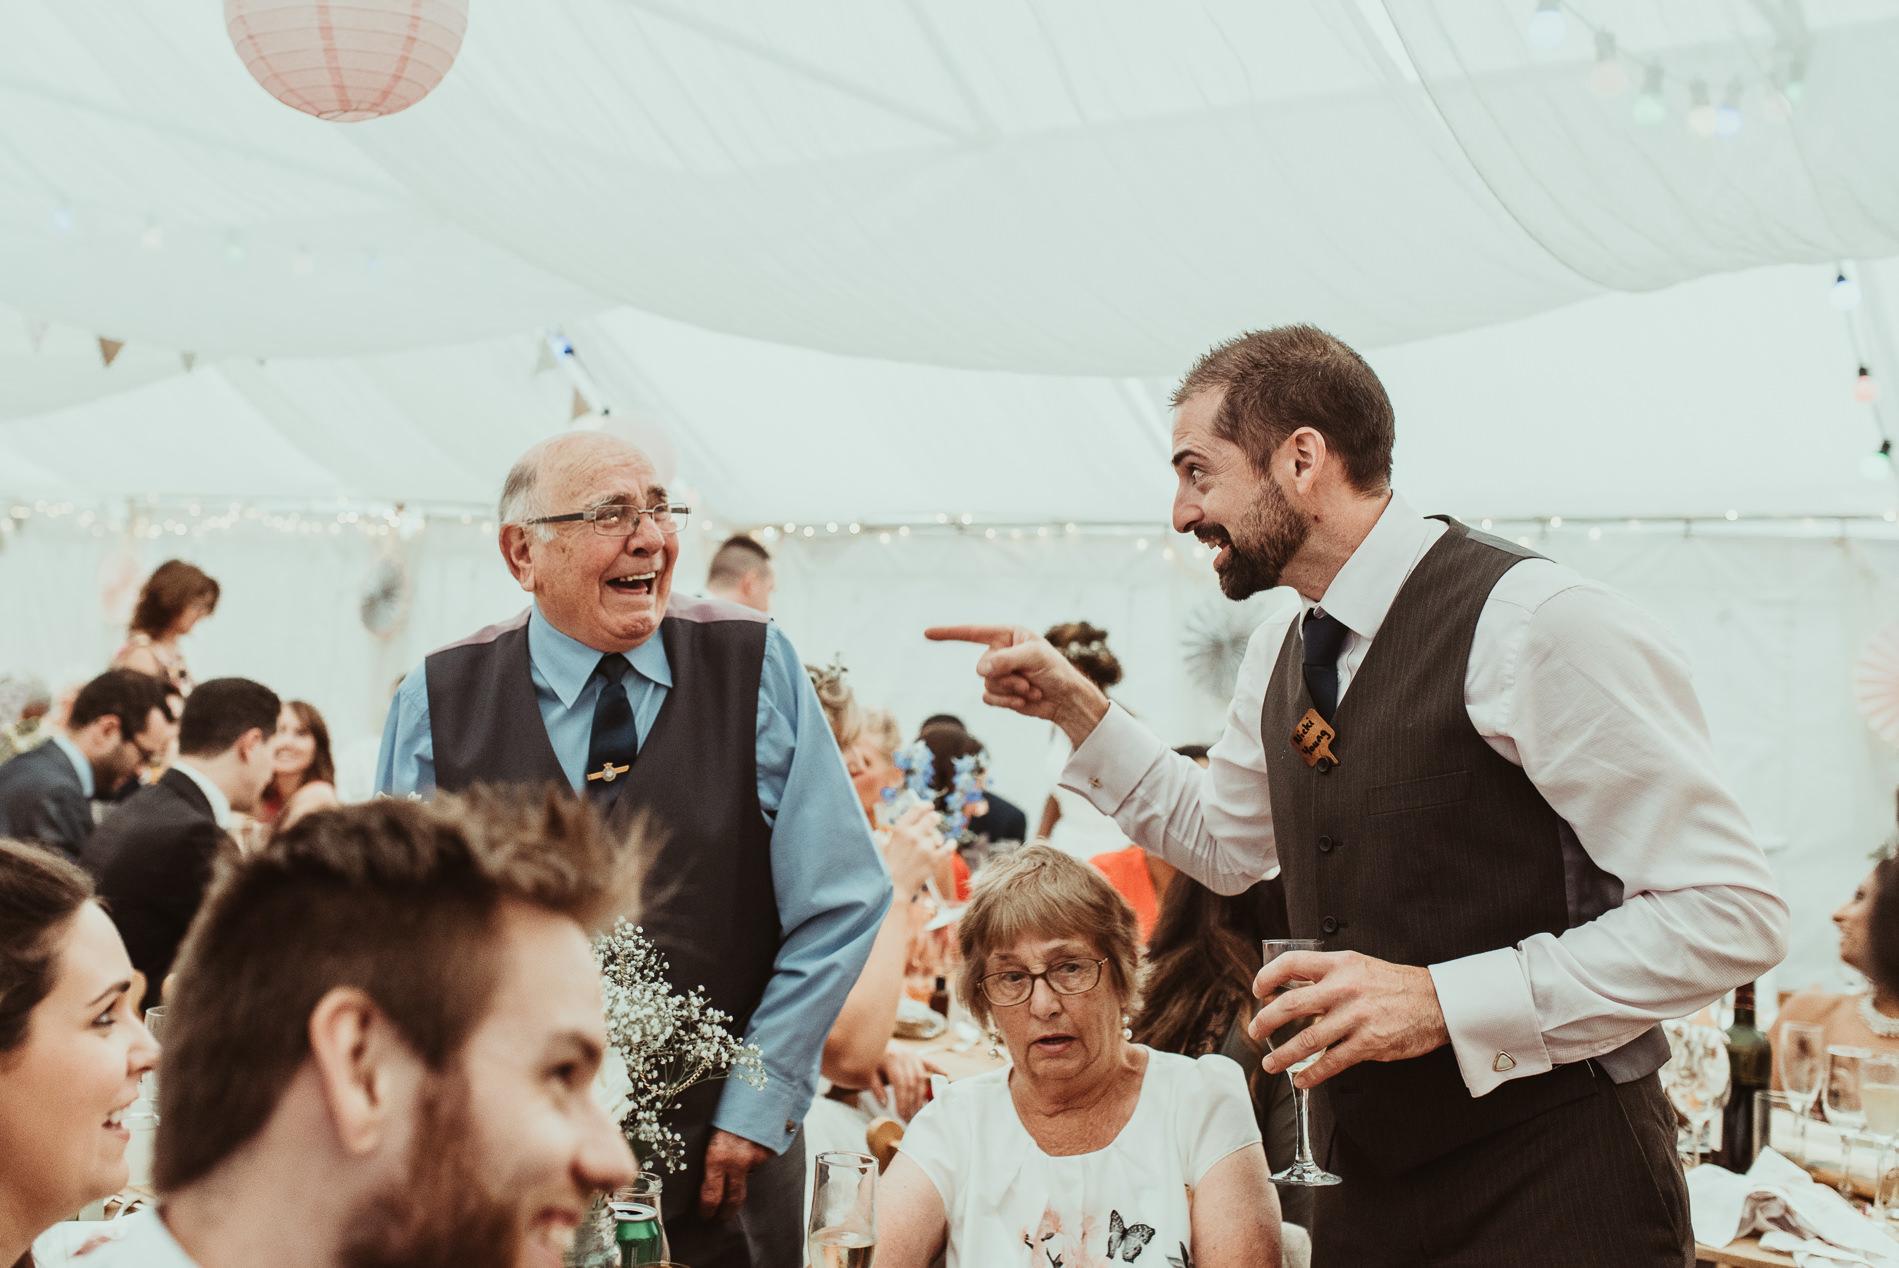 bohemian_wedding_lawshall_church_garden124